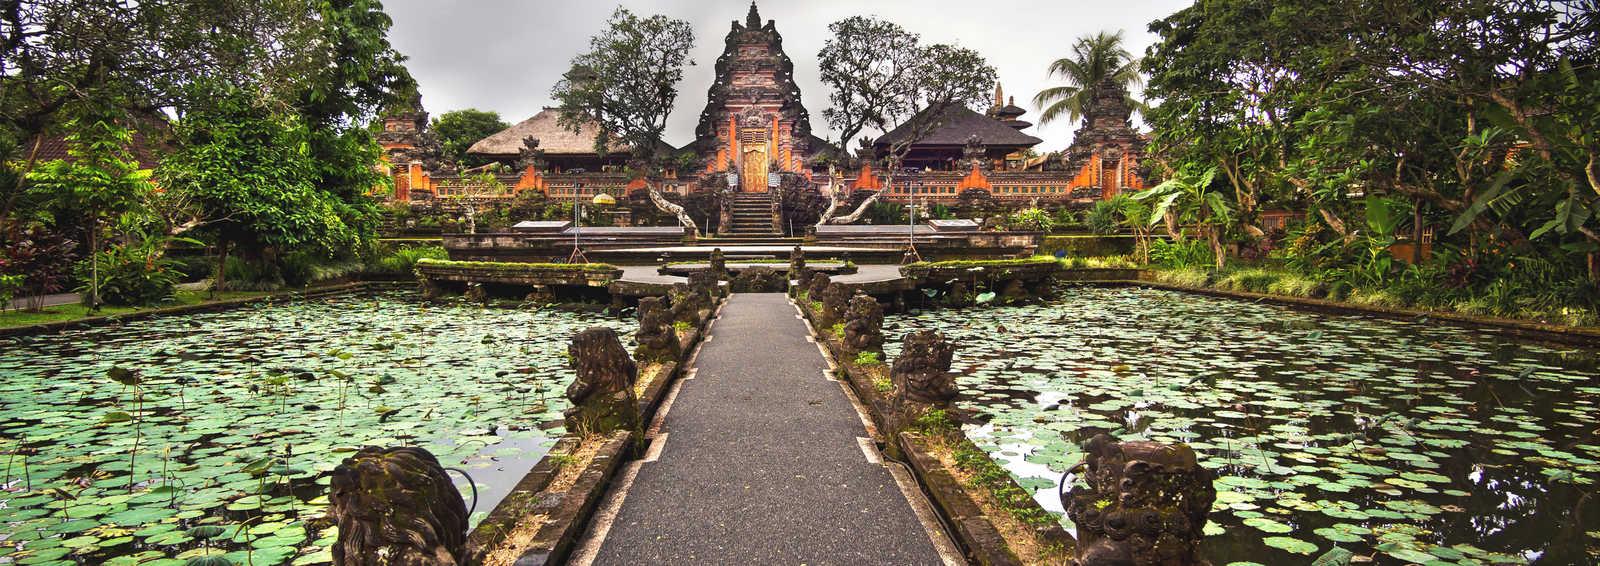 Pura Saraswati temple in Ubud, Bali